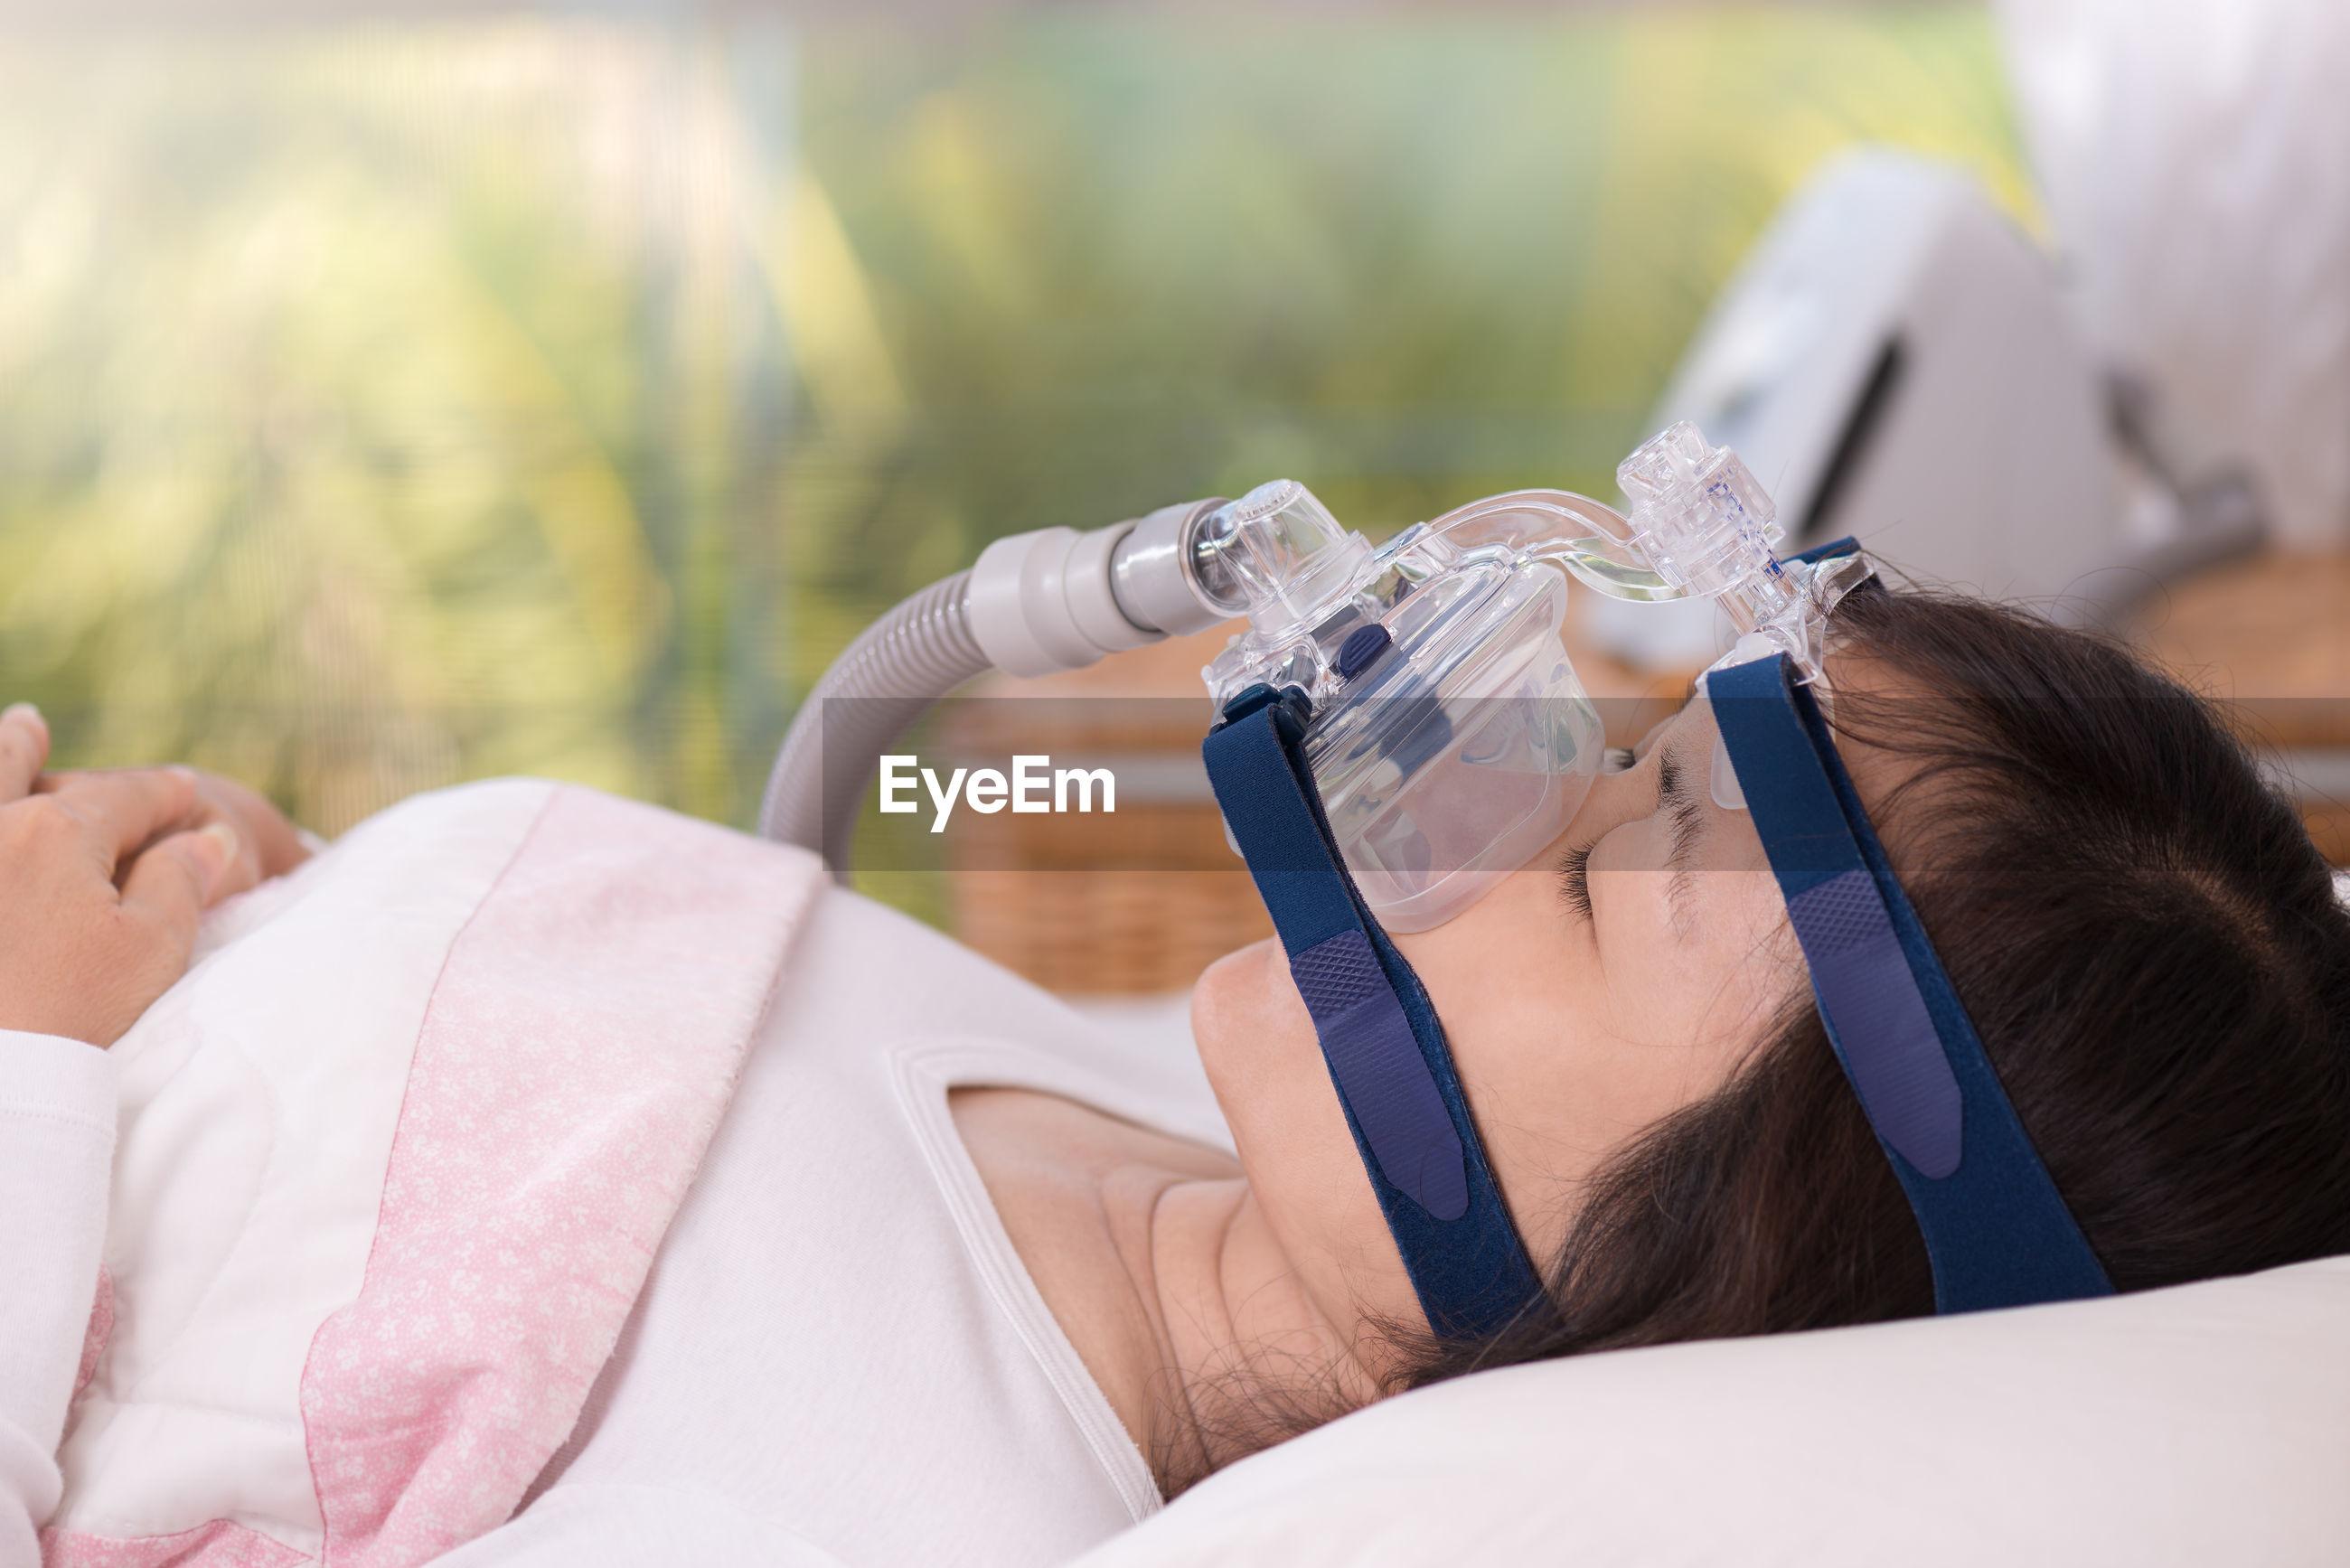 Side view of woman taking apnea treatment